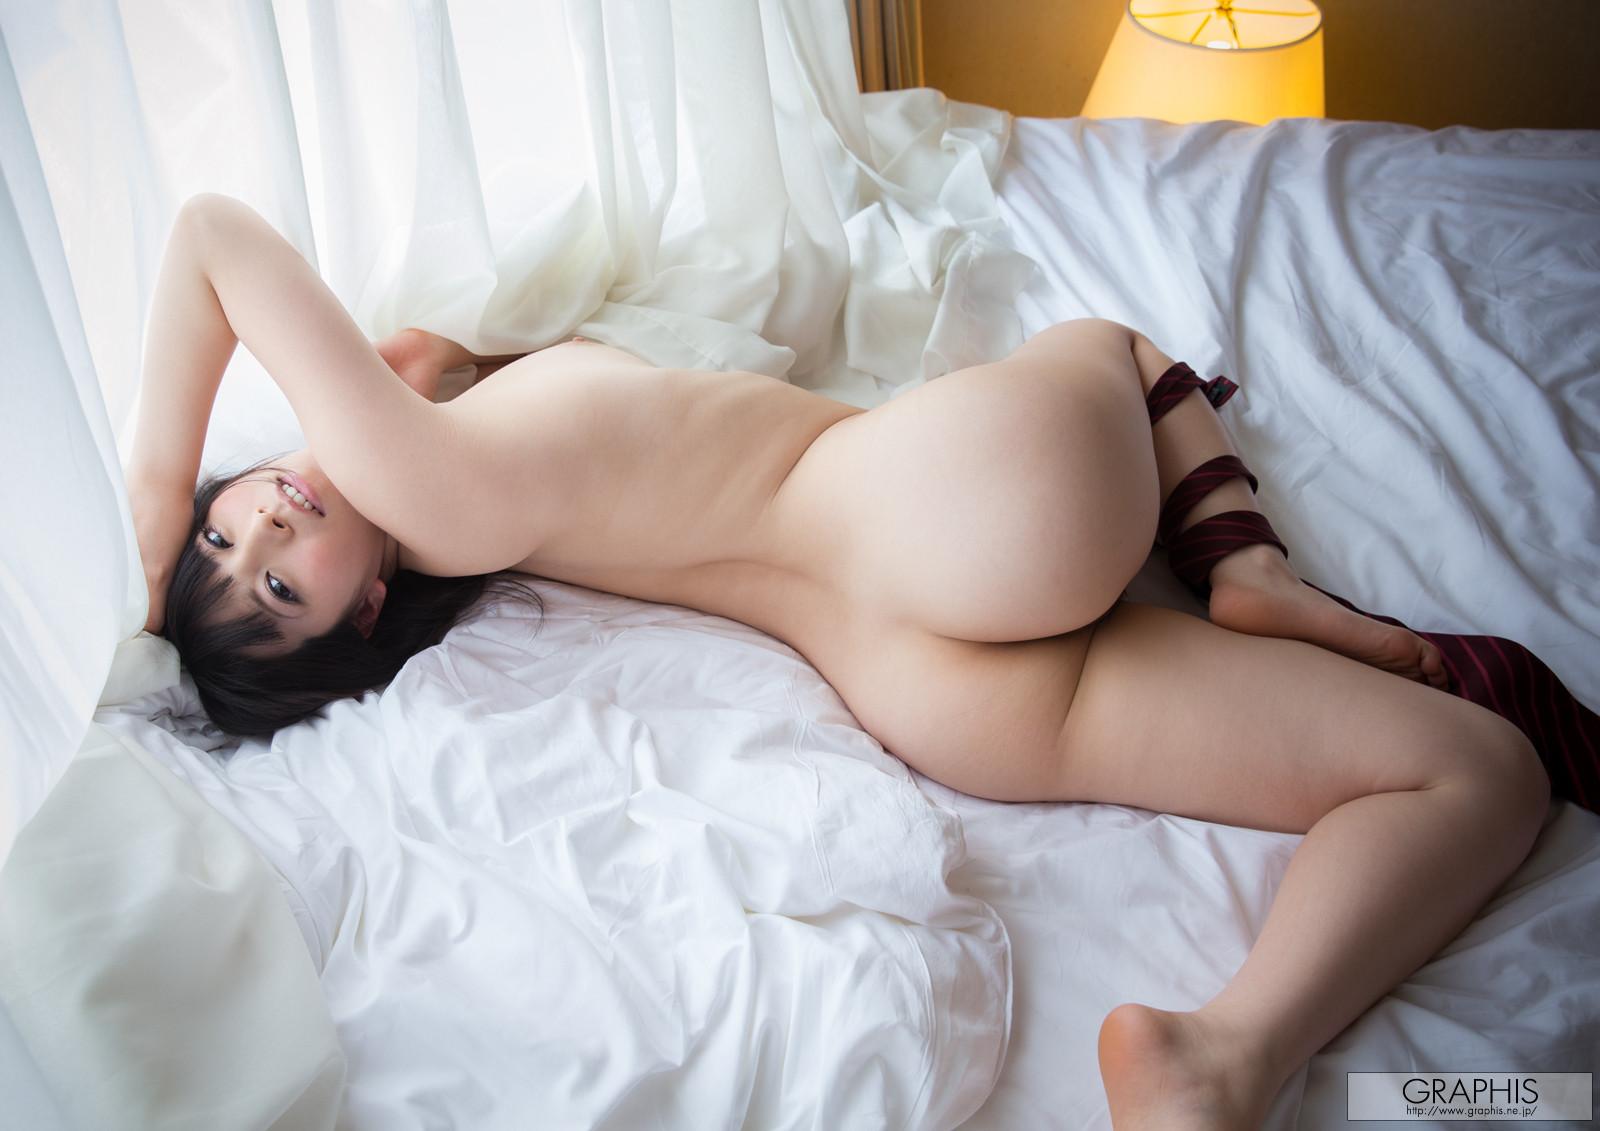 Ai Uehara Sex Doll ai uehara porn pic - eporner